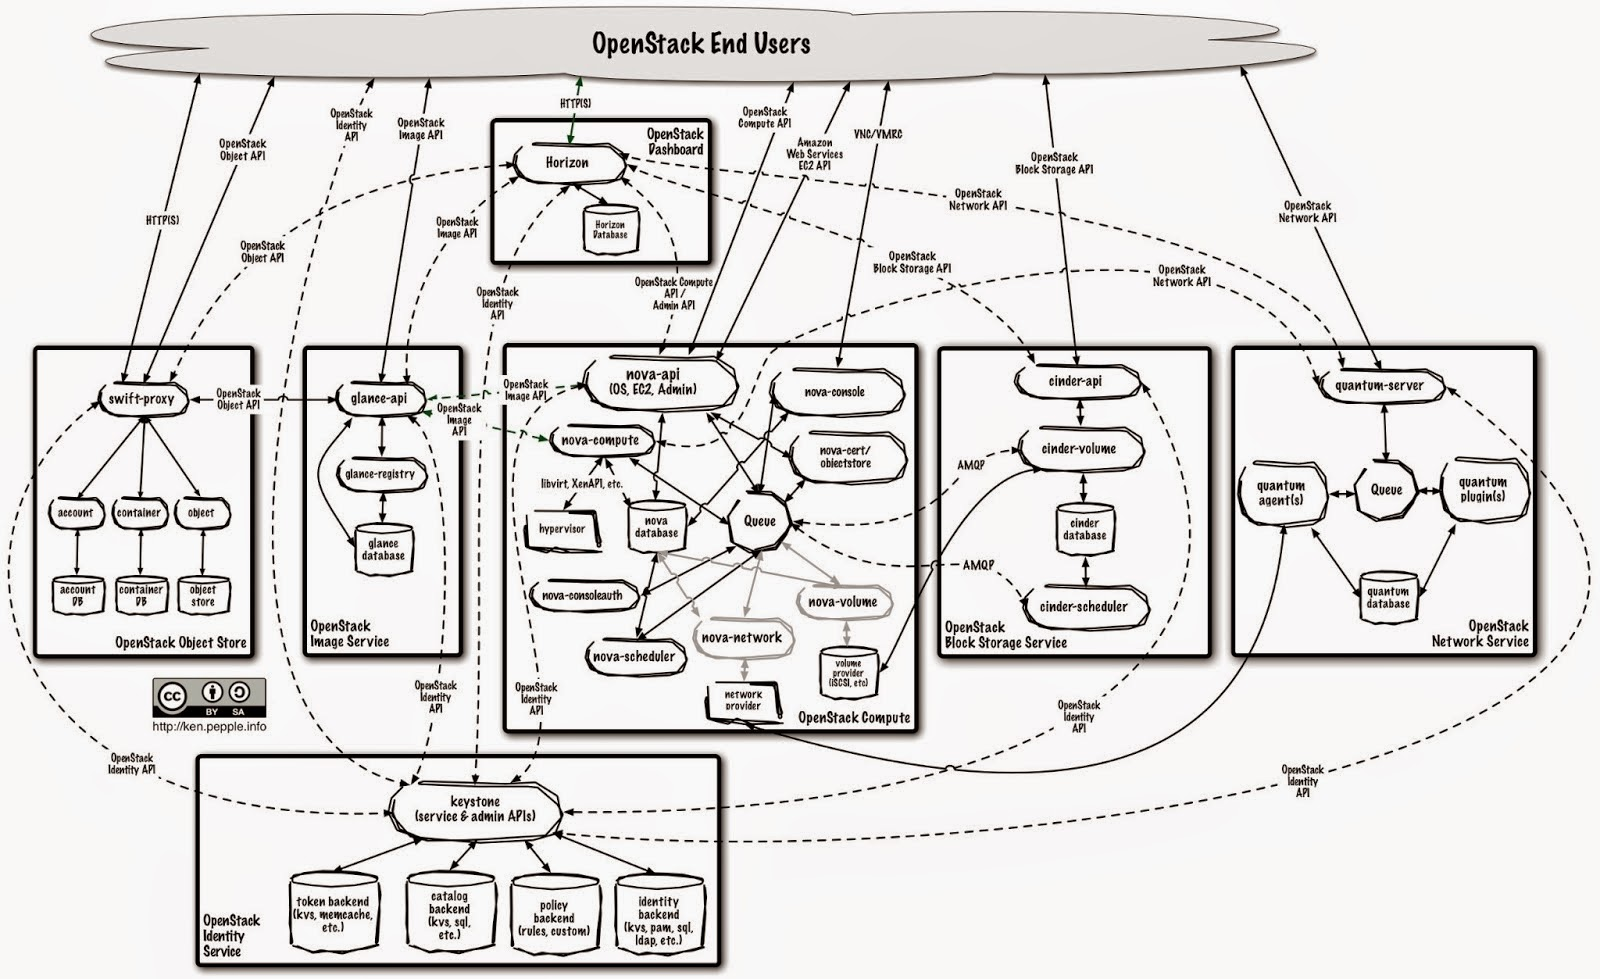 kk u0026 39 s linux sysadmin foundation  installing openstack